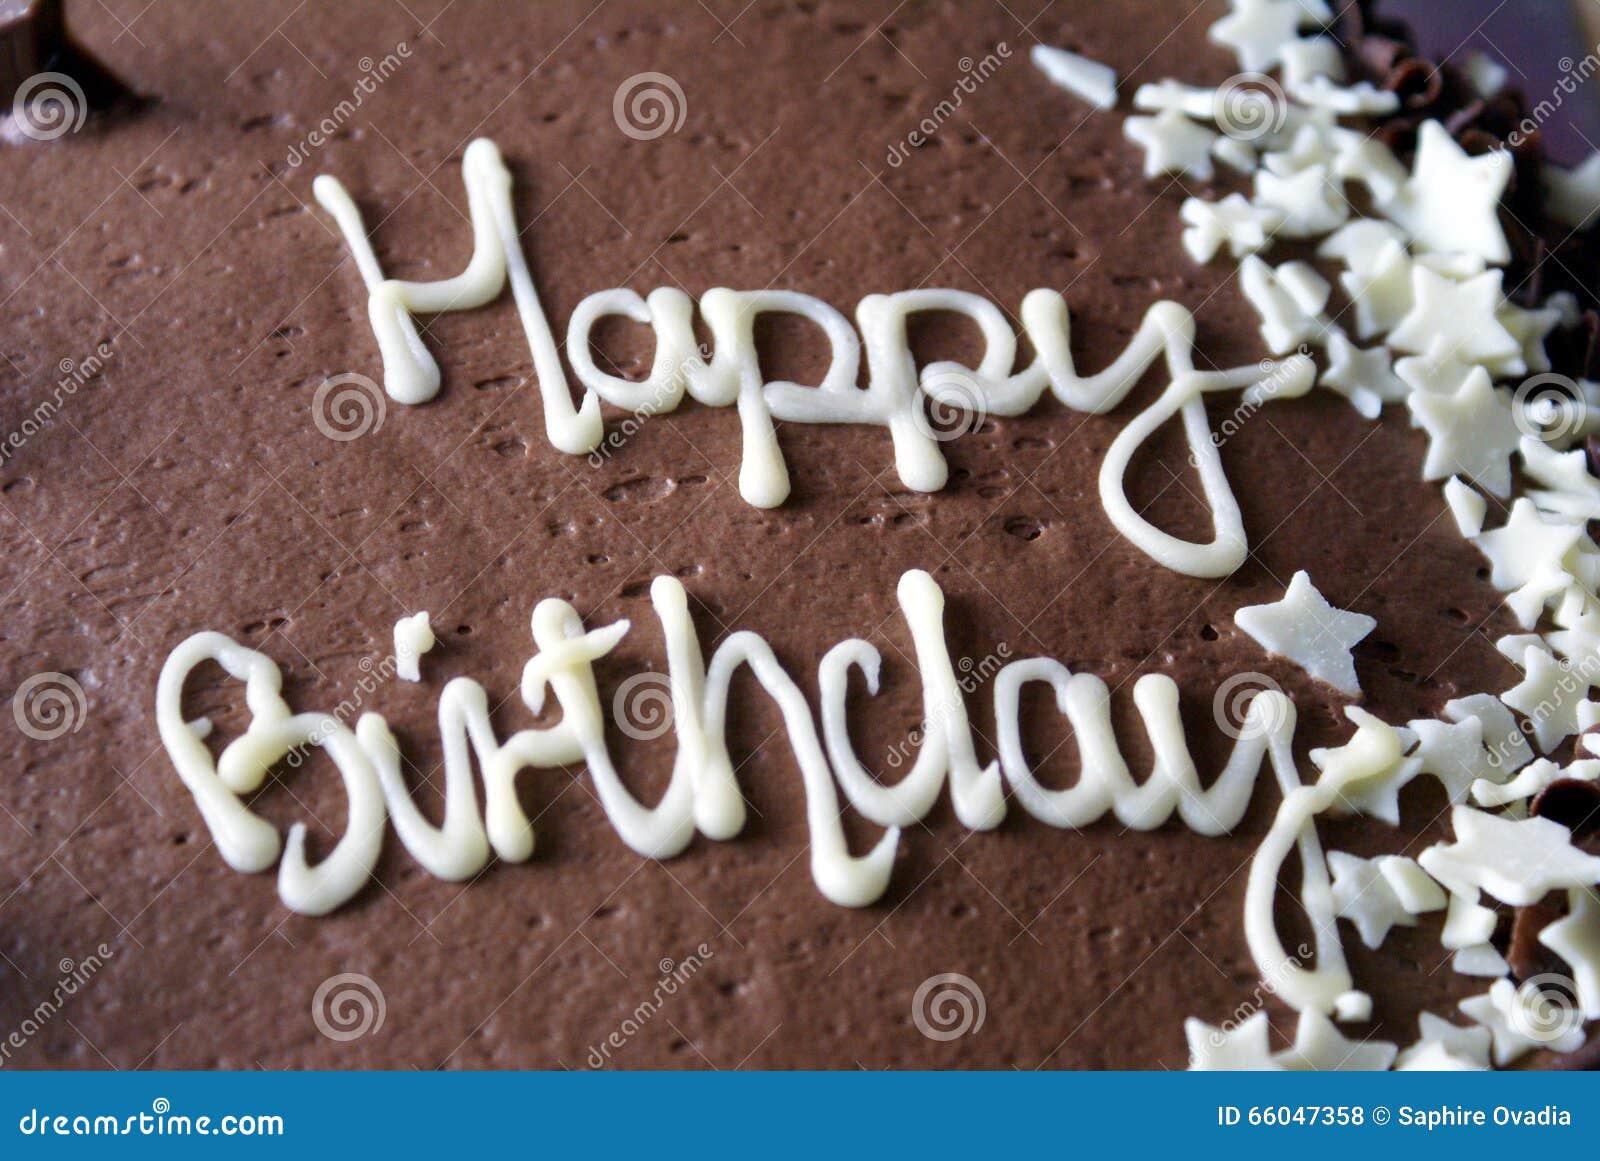 Happy Birthday Chocolate Cake Birthday Cake Stock Photo Image